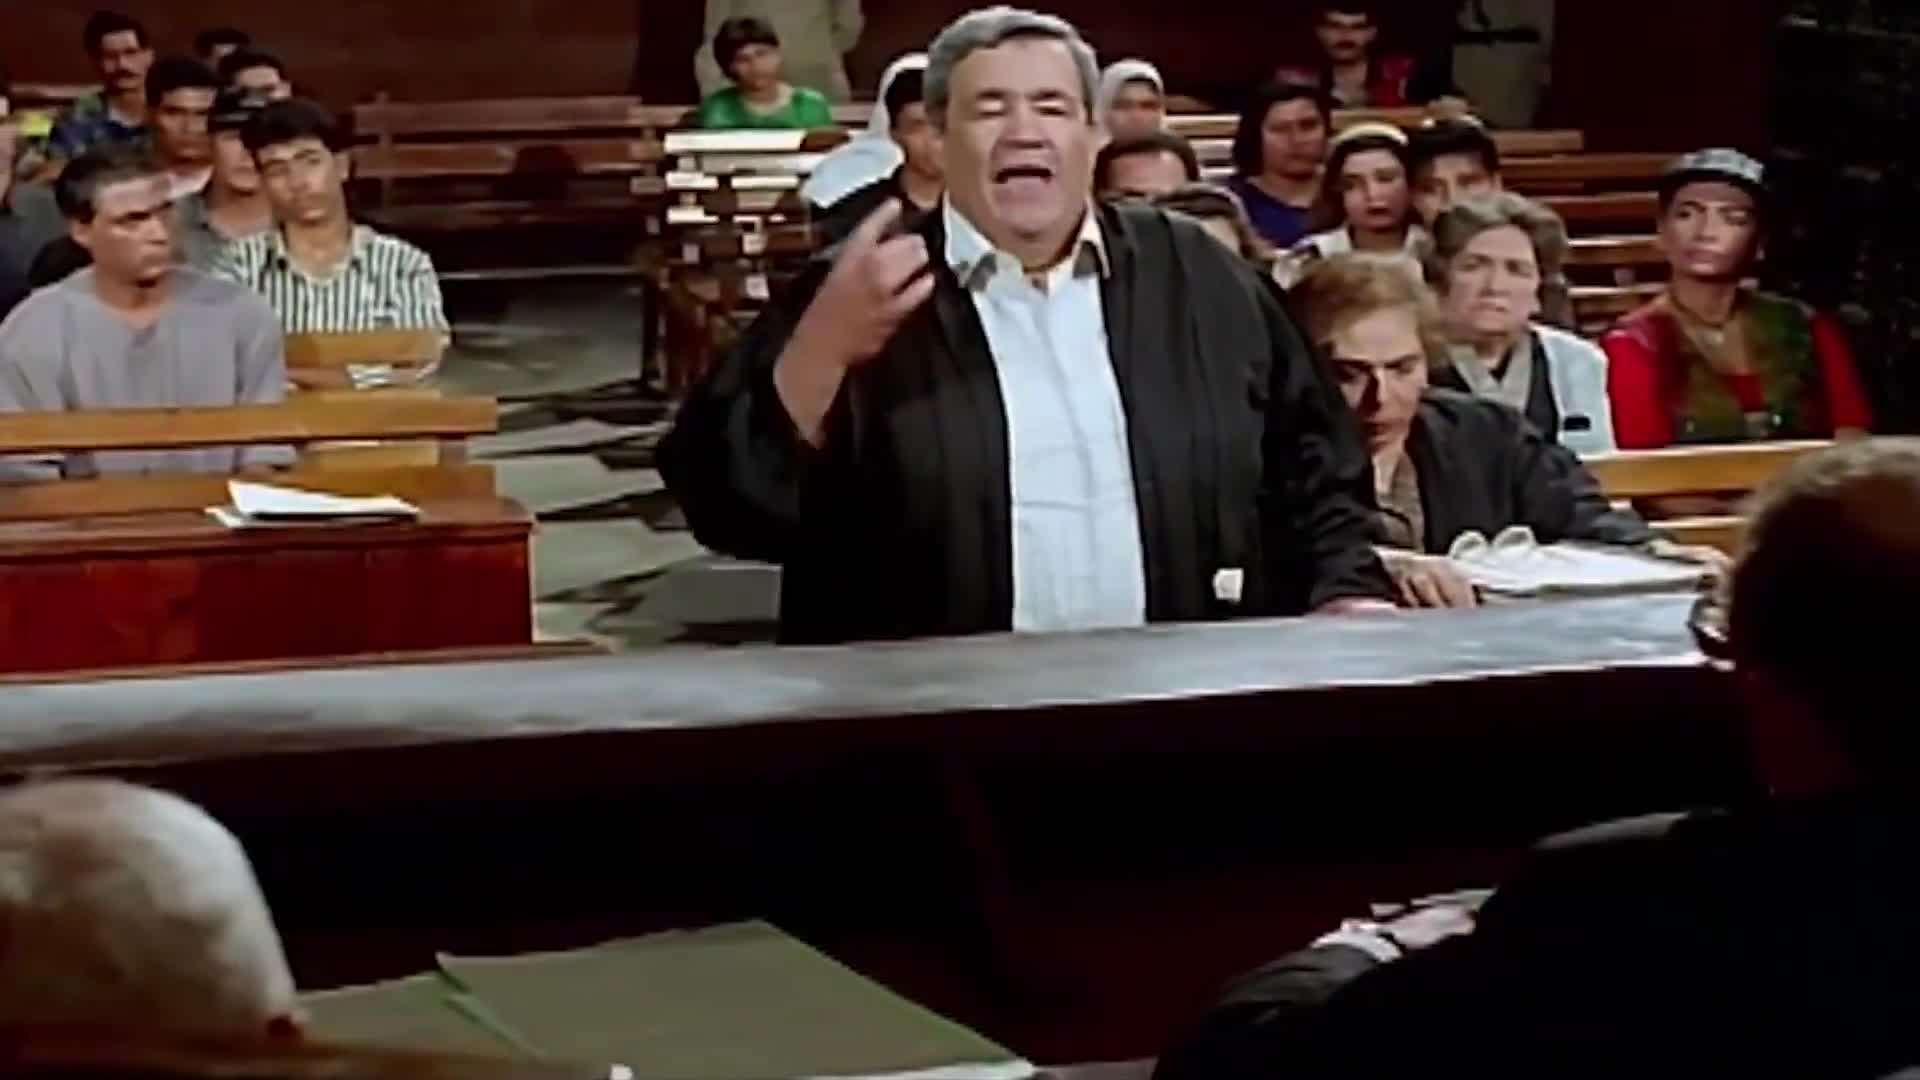 [فيلم][تورنت][تحميل][استاكوزا][1996][1080p][Web-DL] 11 arabp2p.com